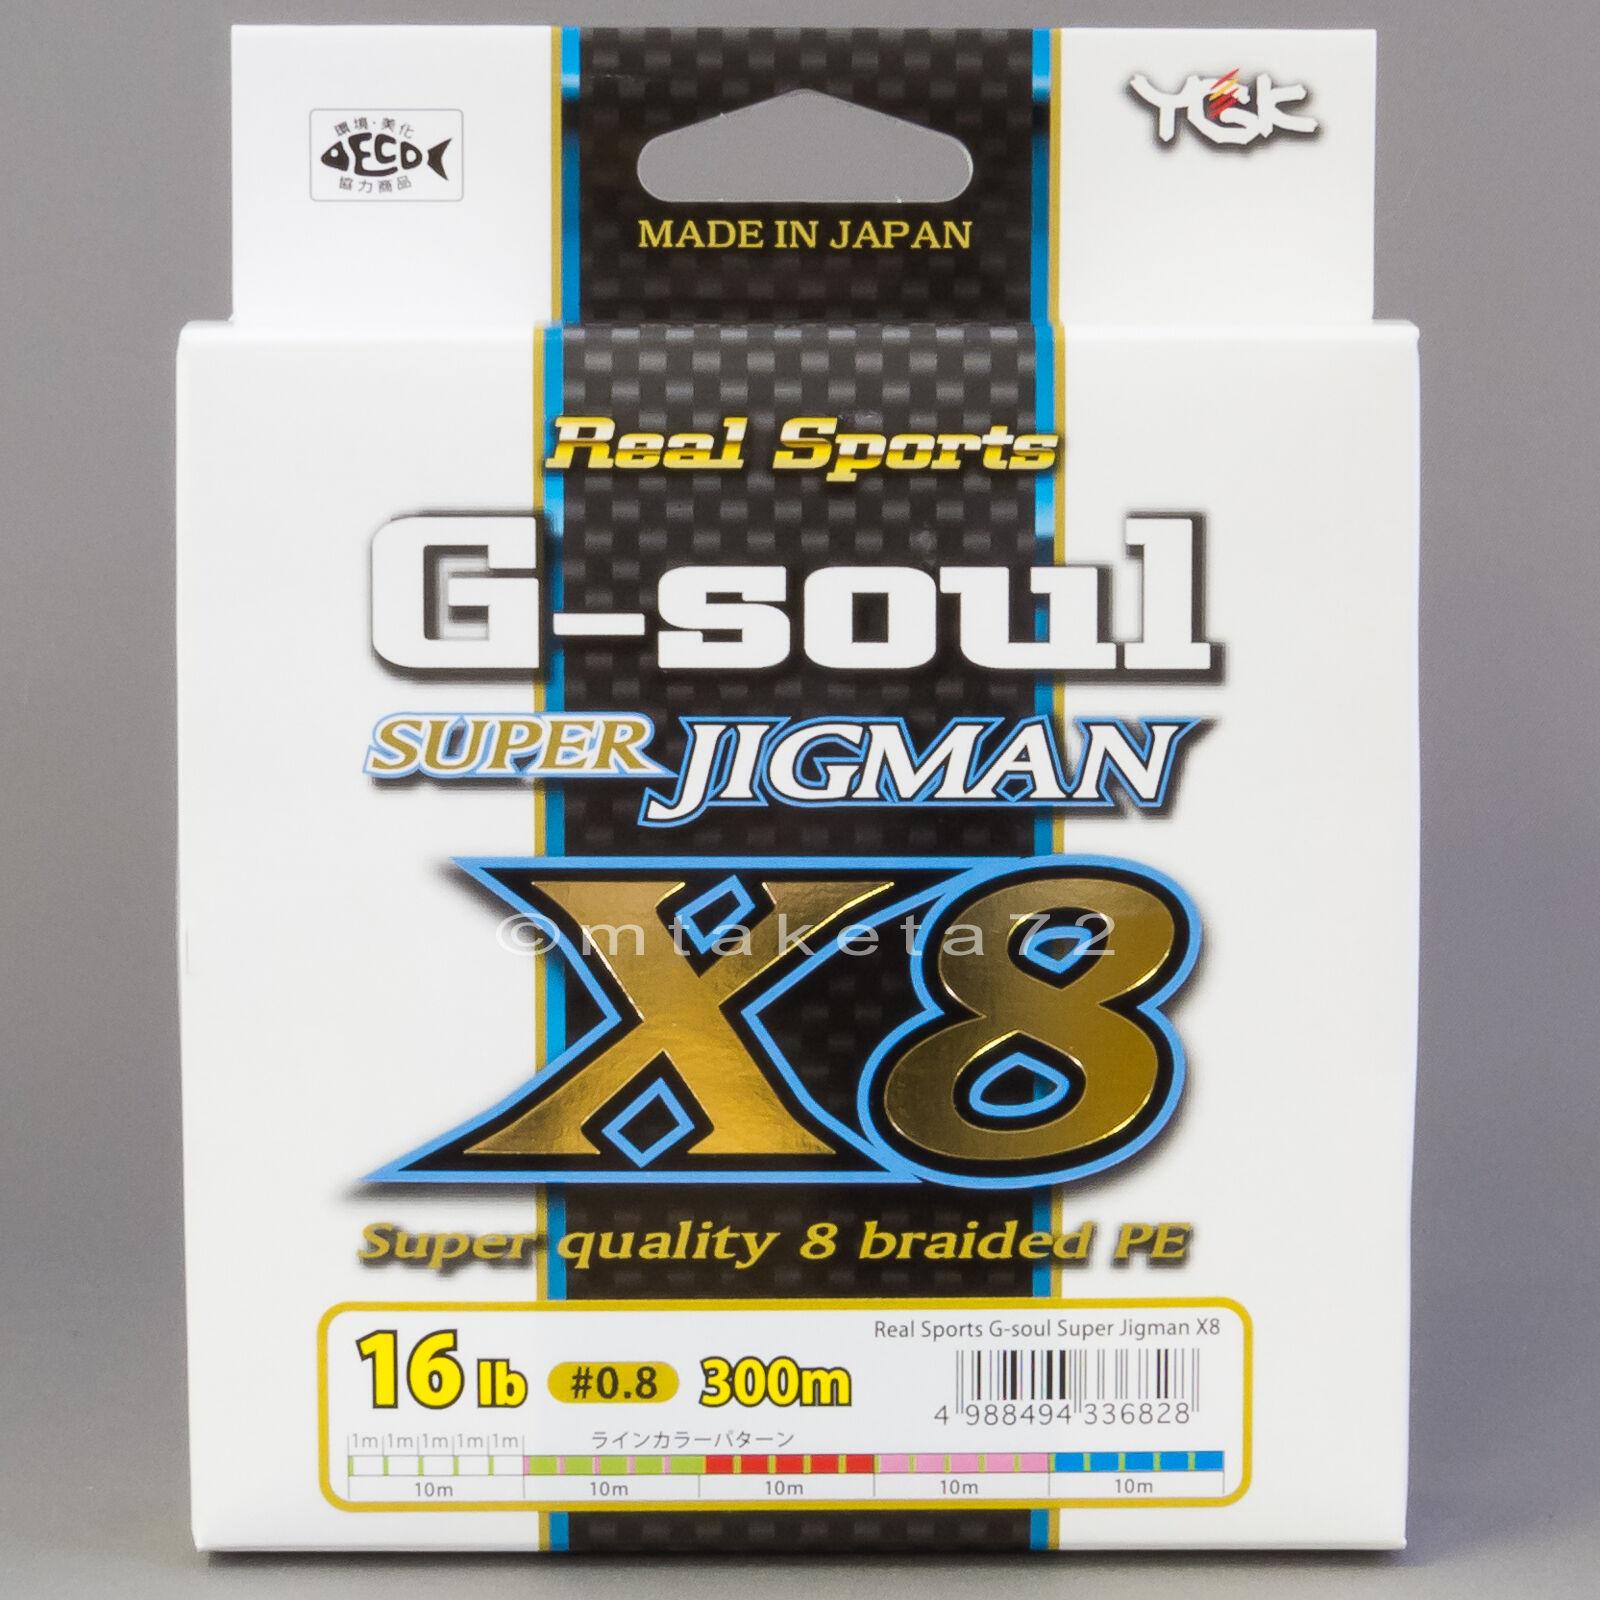 YGK G-Soul SUPER JIGMAN X8 lb 300m, PE Braided Line, 336828